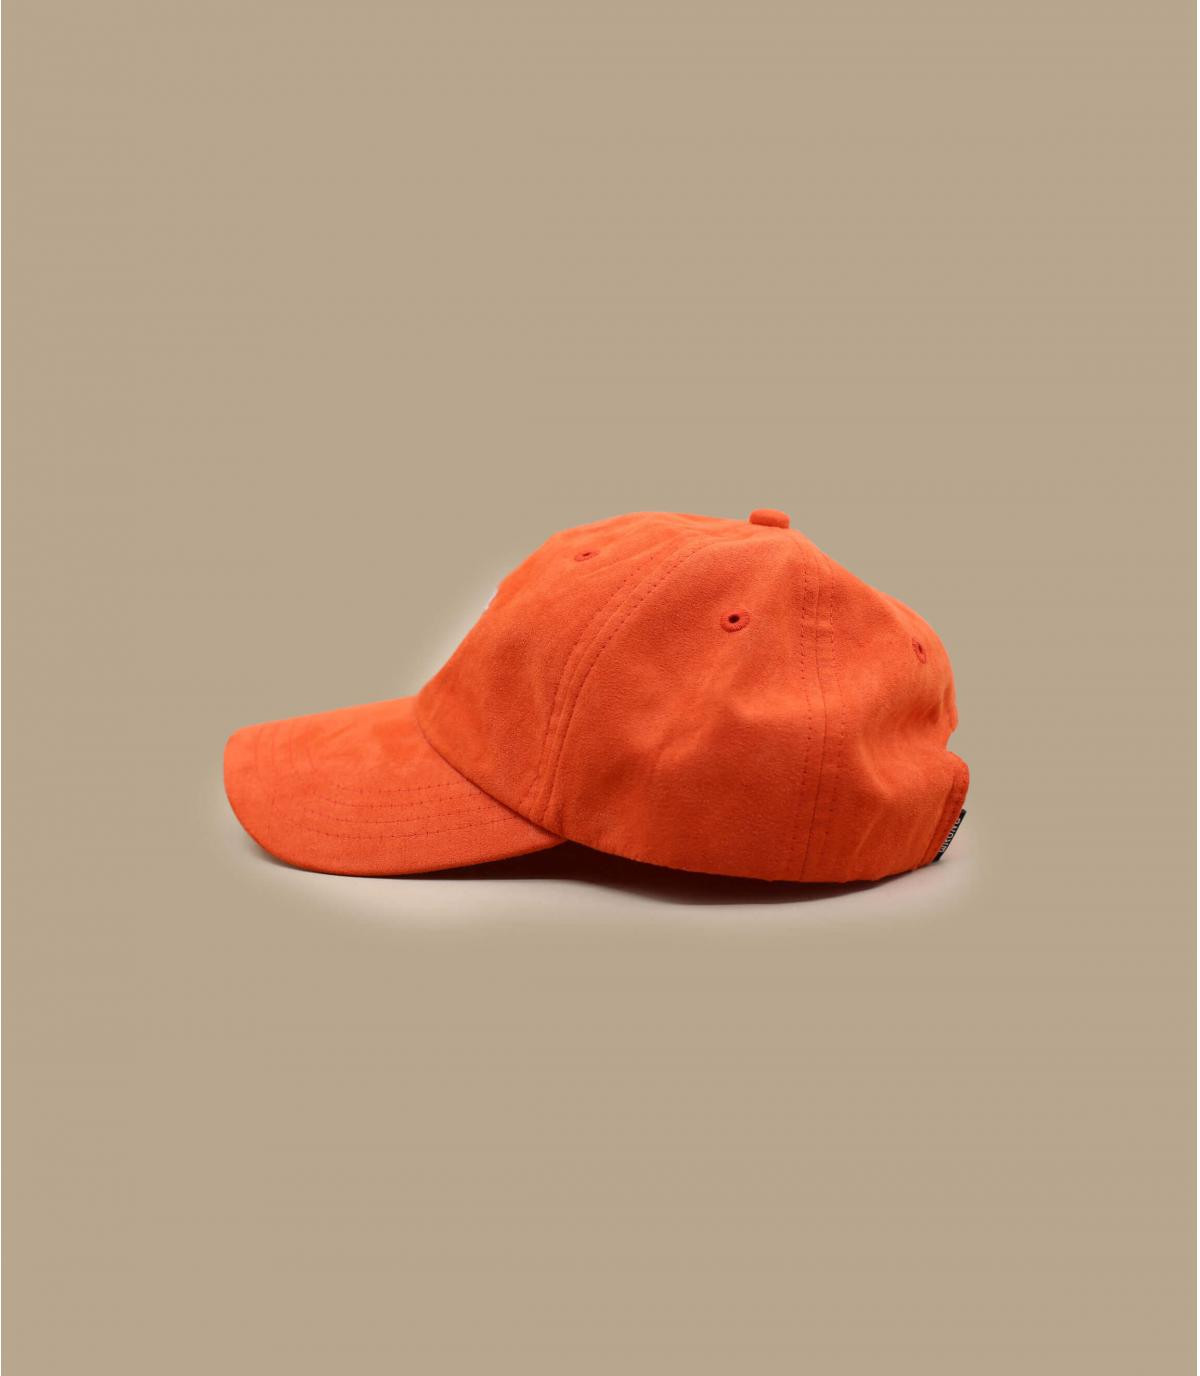 Details Sign Ball orange - Abbildung 3